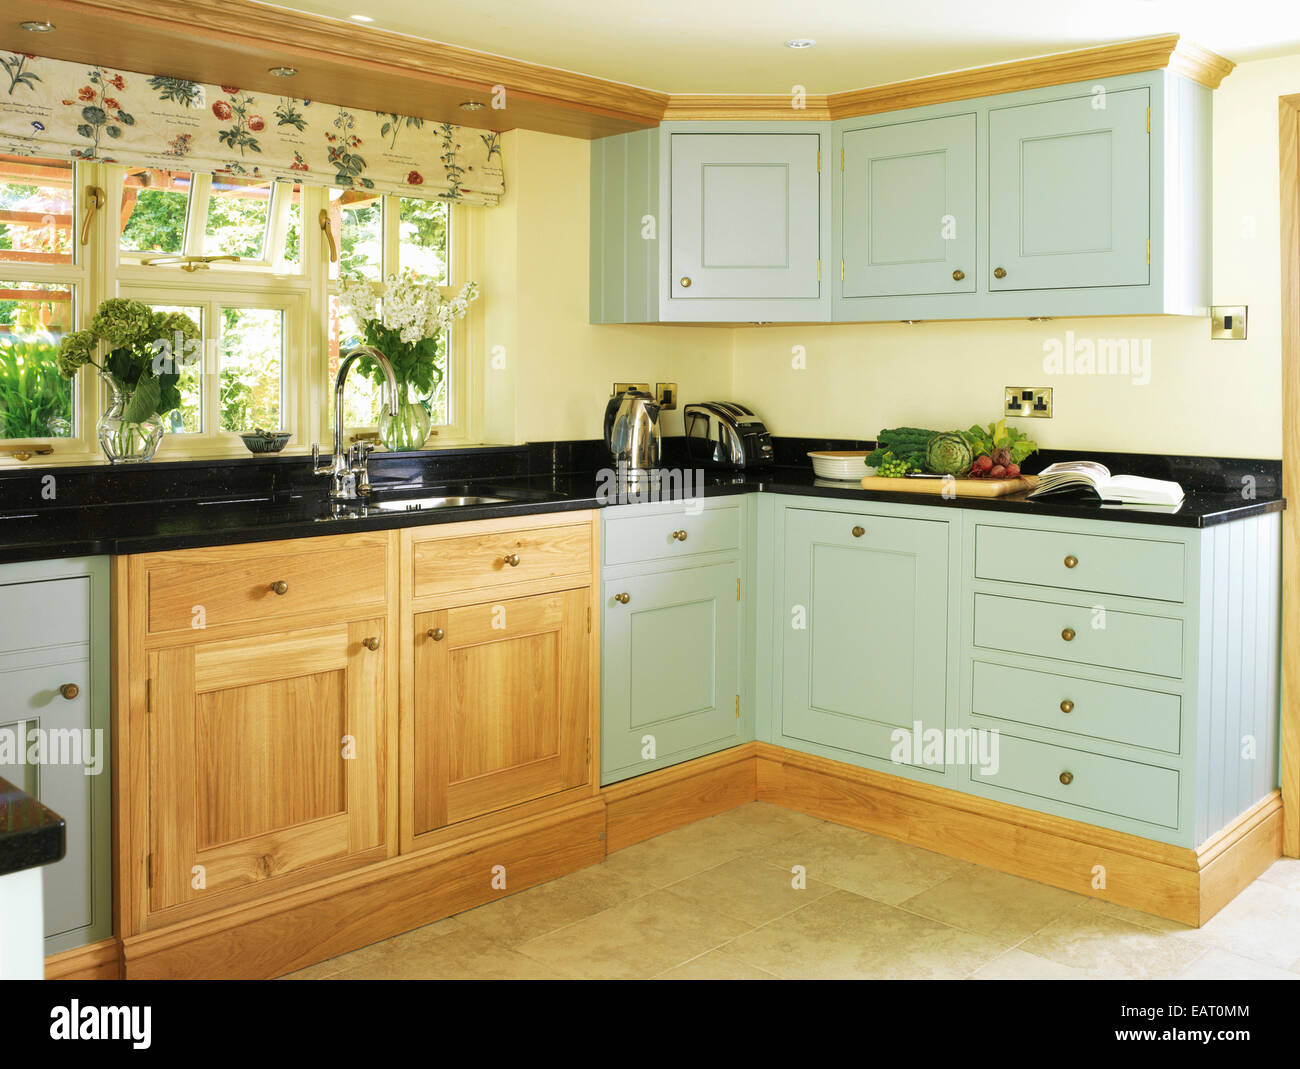 In stile country con cucina verde dotata di unità Foto & Immagine ...